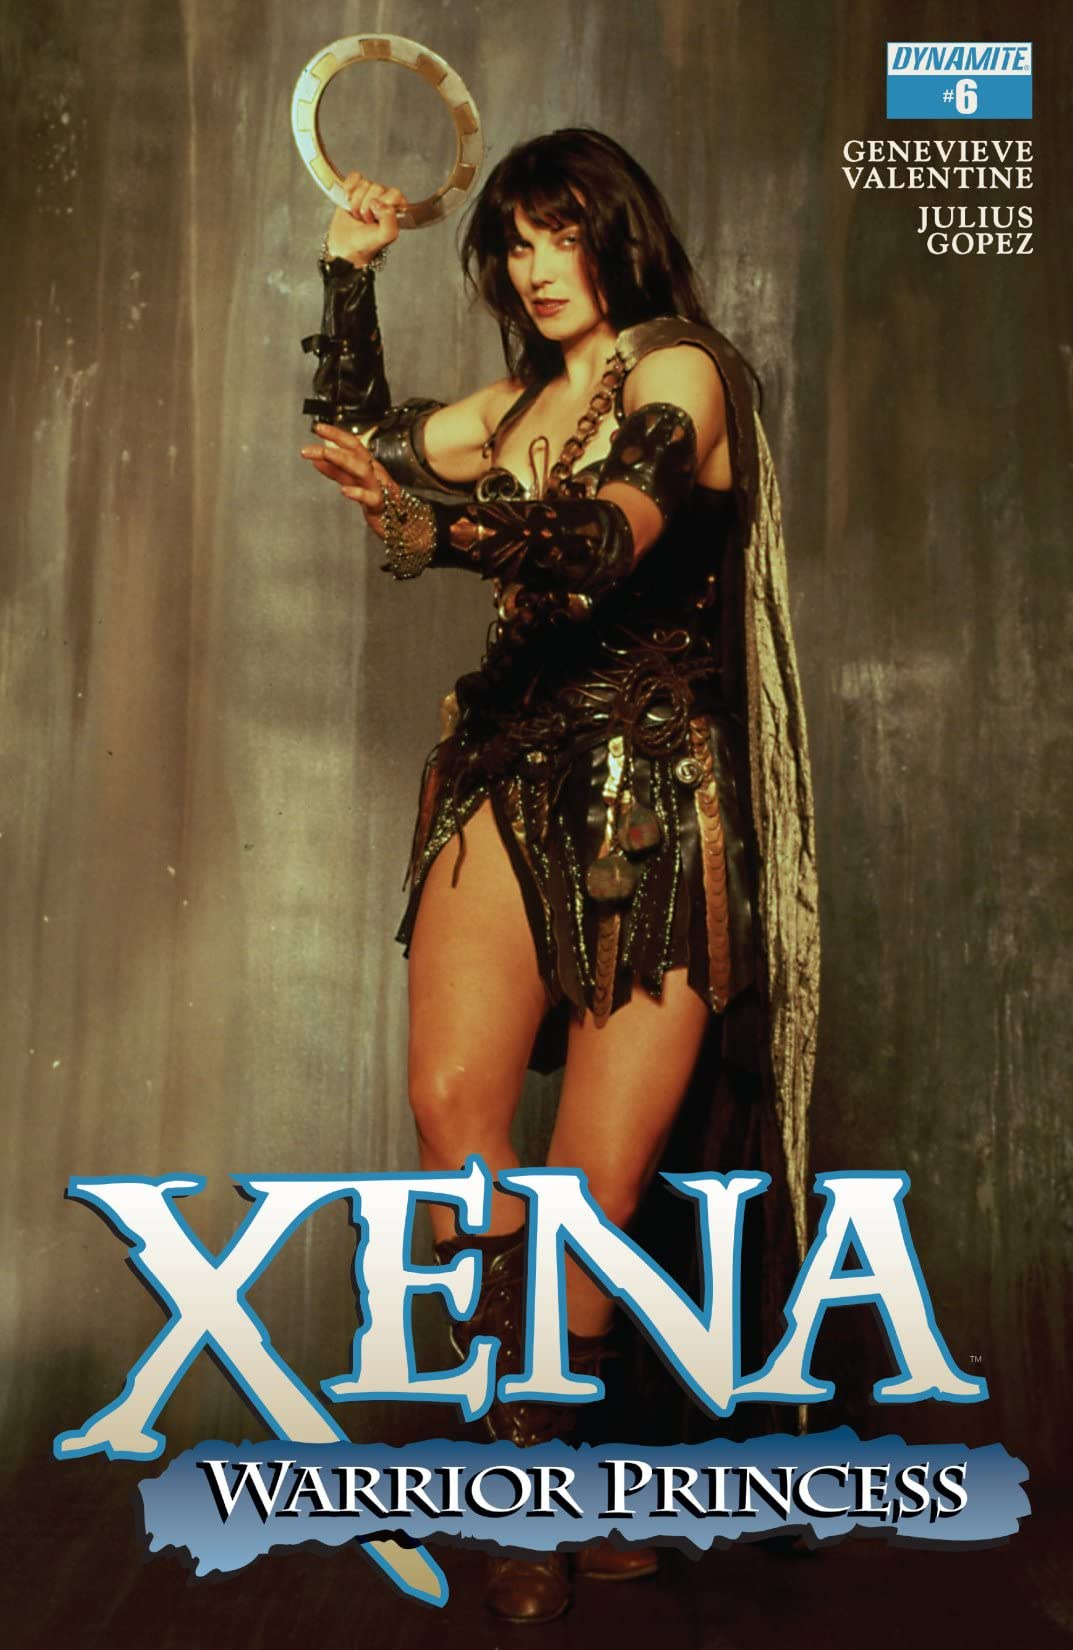 Xena: Warrior Princess (2016) #6: Digital Exclusive Edition - Comics by  comiXology: Web UK